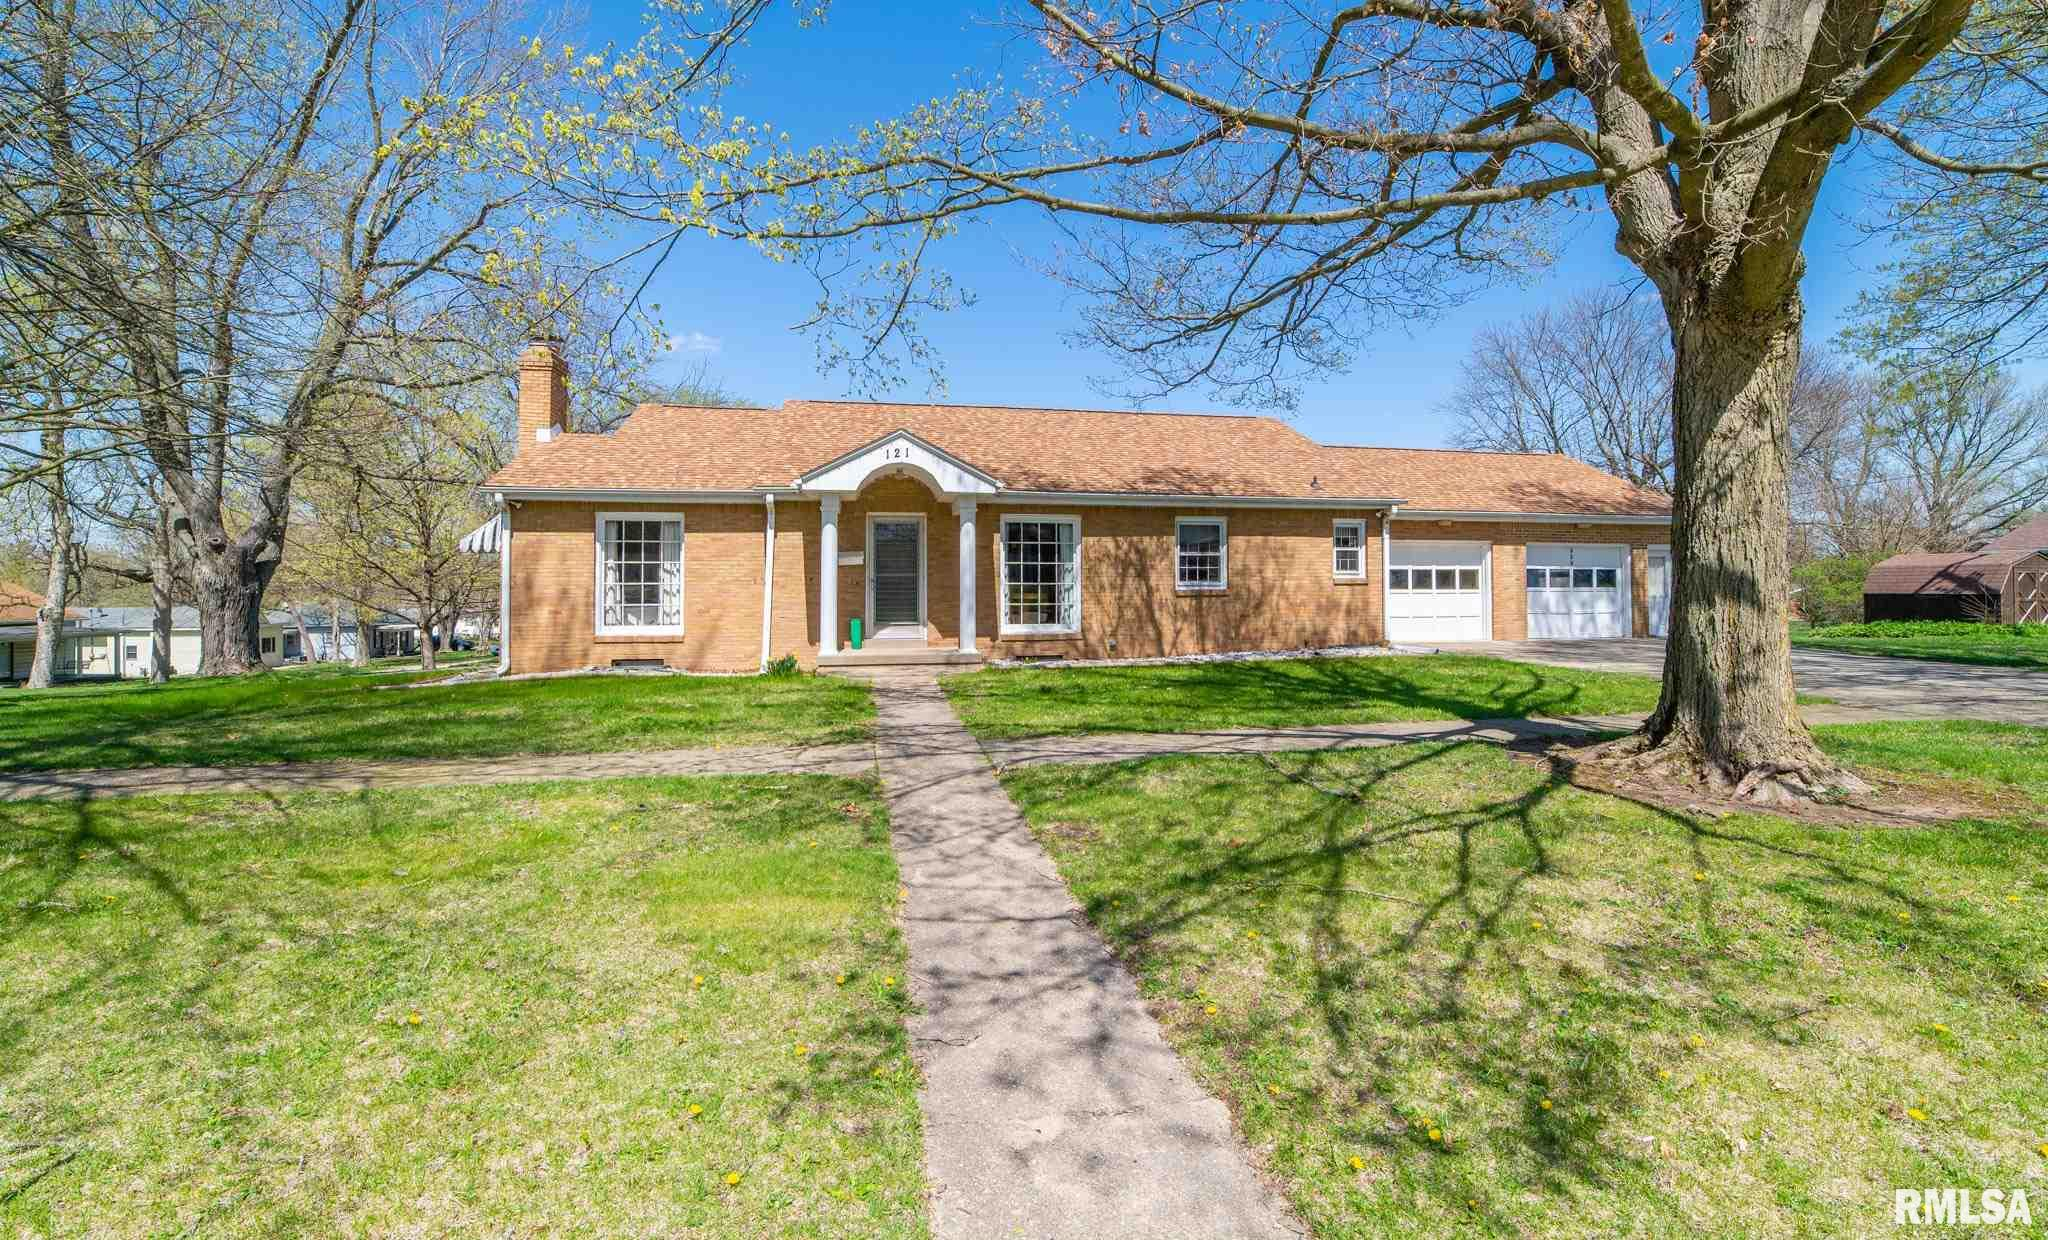 121 W MORGAN Property Photo - Mt Pulaski, IL real estate listing